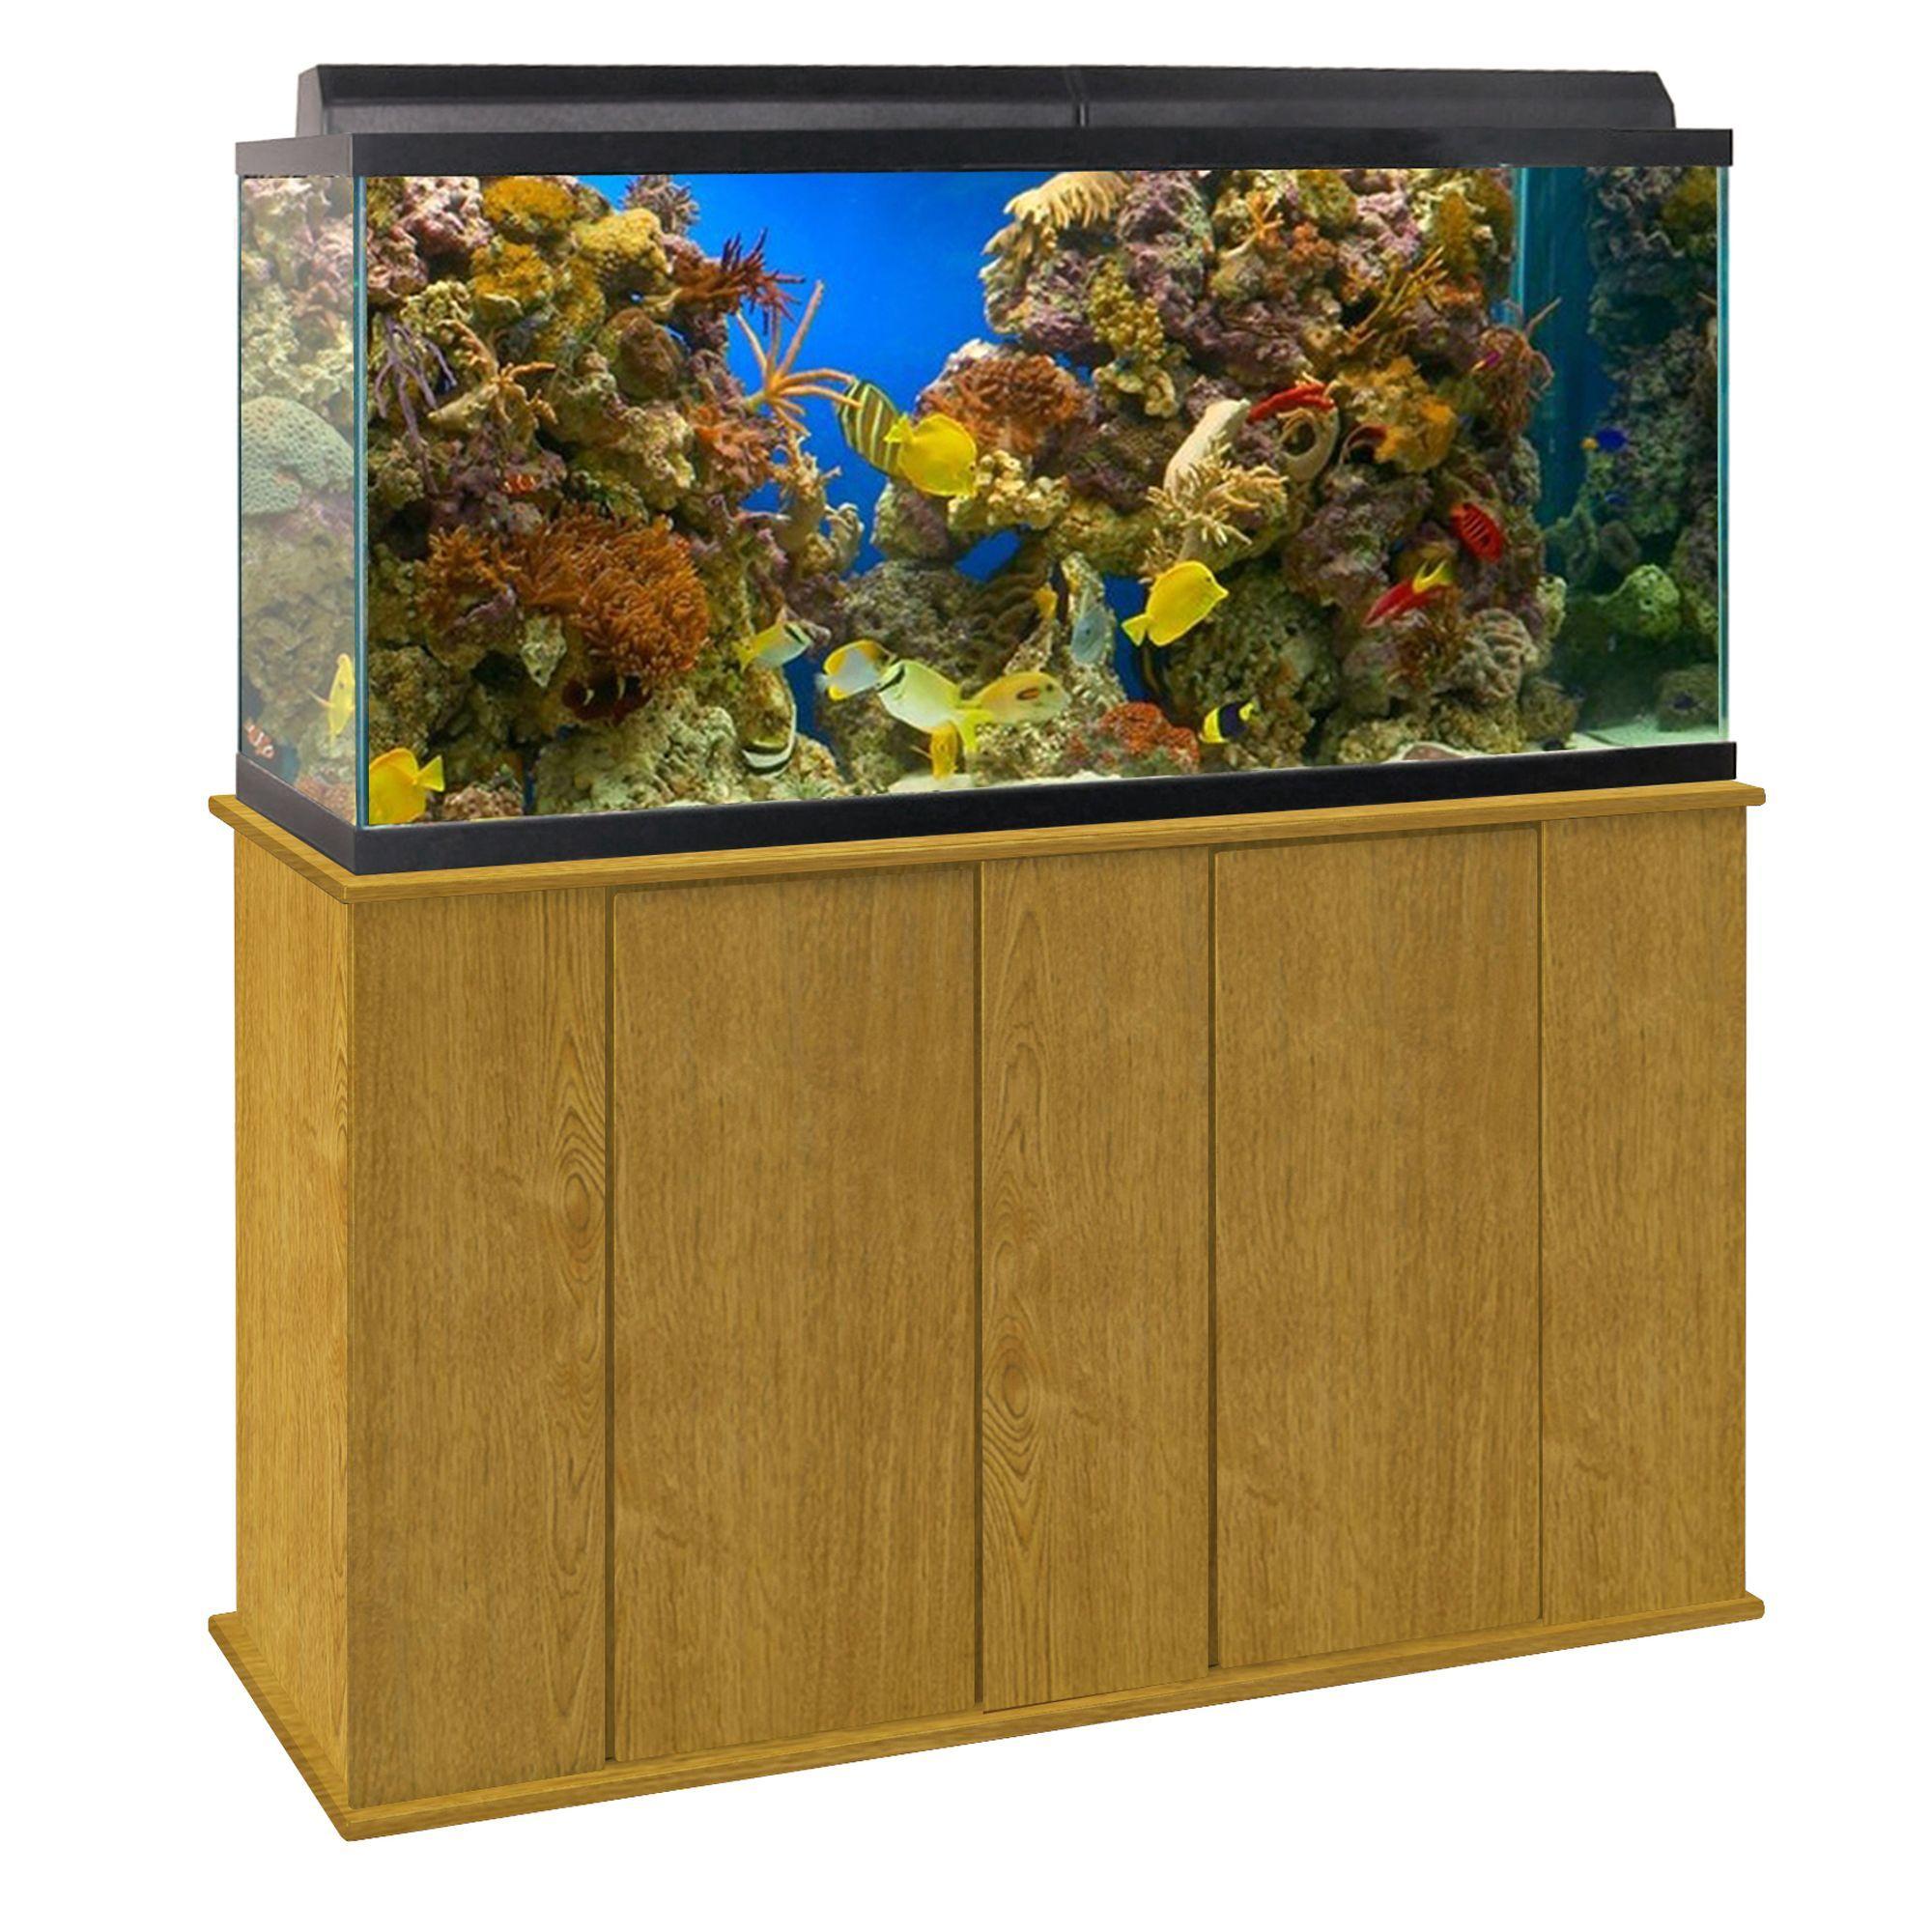 Marco 7590 Gallon Upright Aquarium Stand, Brown